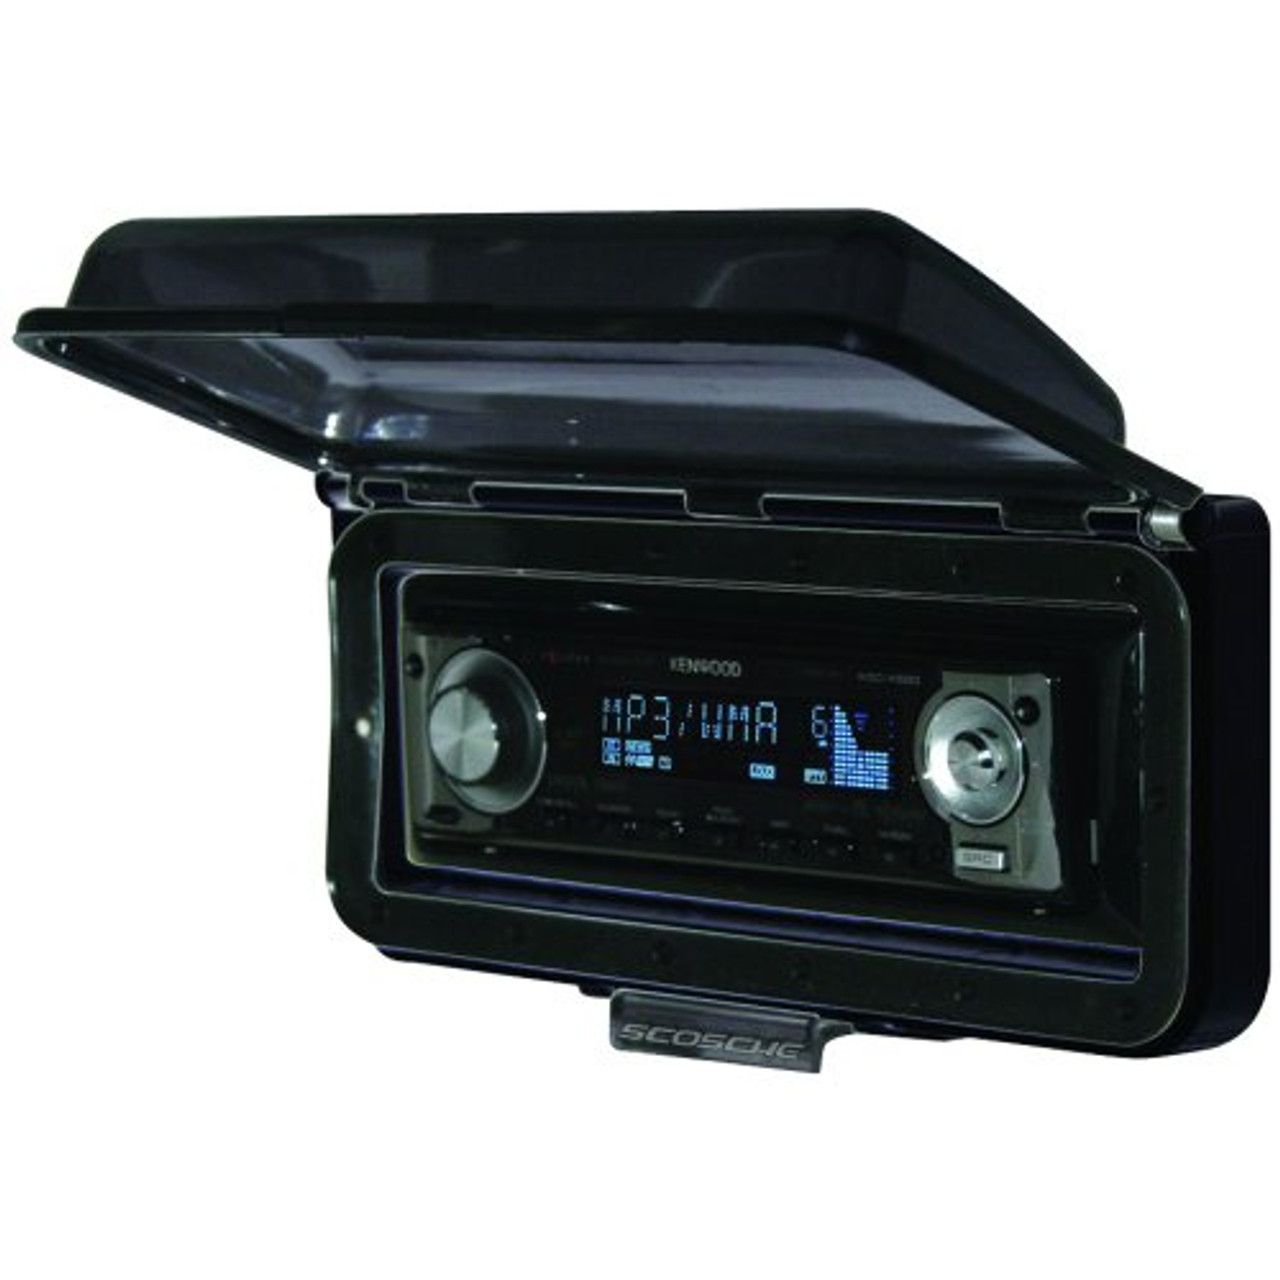 New Scosche Radio Splash Proofe Stereo Cover For Car Marine ATV Stereo  Weather Shiled (BLACK) ACM3B